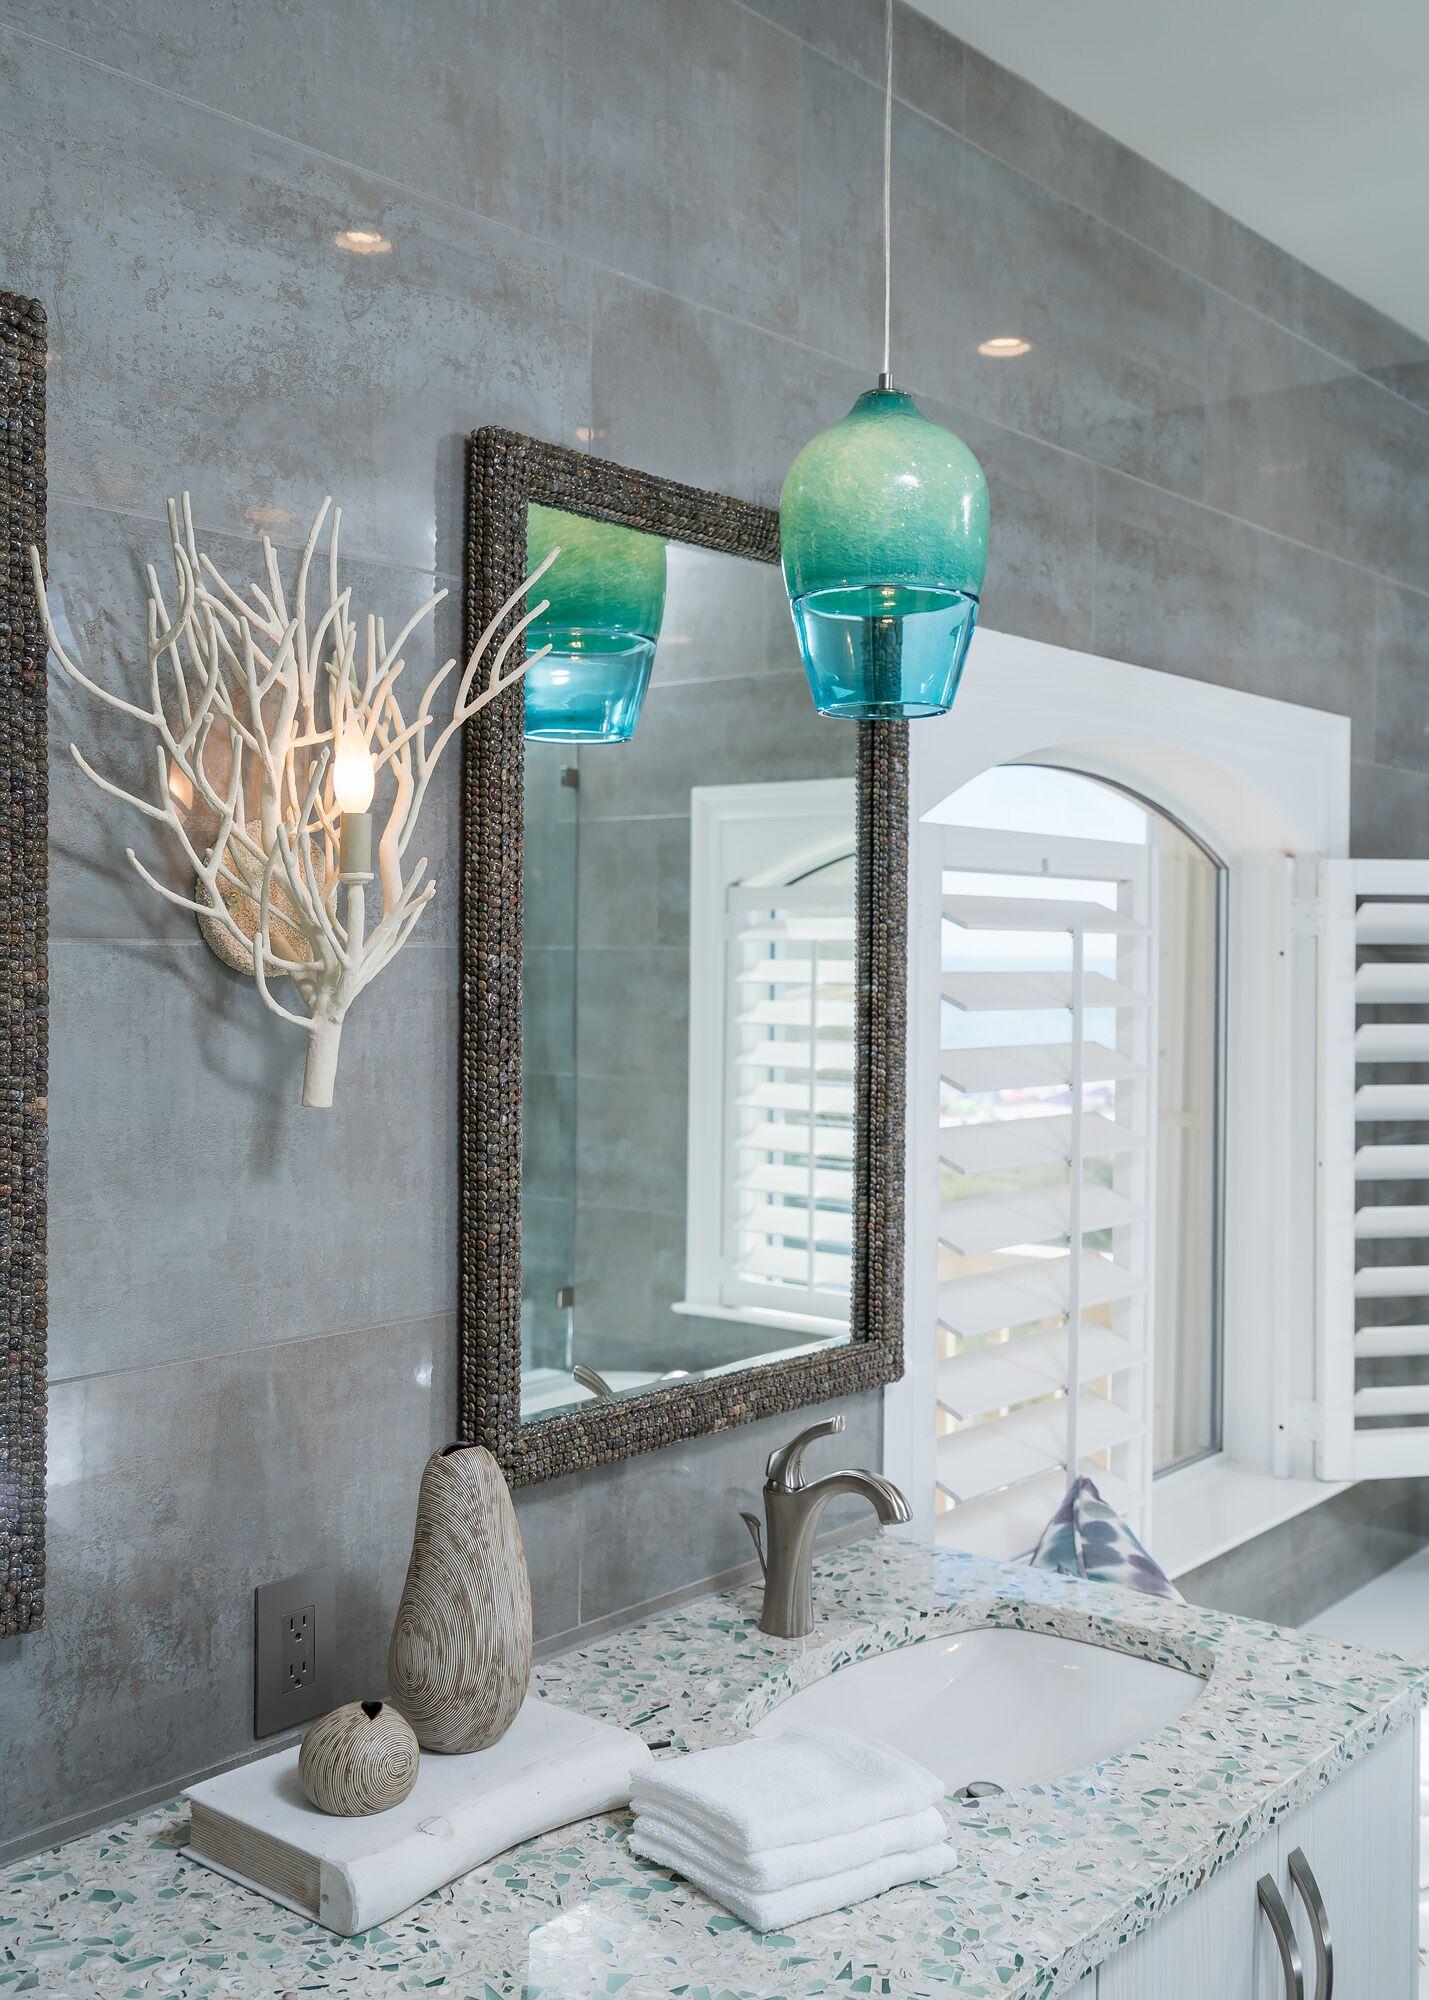 DESIGNER SPOTLIGHT - Cheryl Kees Clendenon, #vanity #bathroom #masterbath #vetrazzo #bathroomdesign